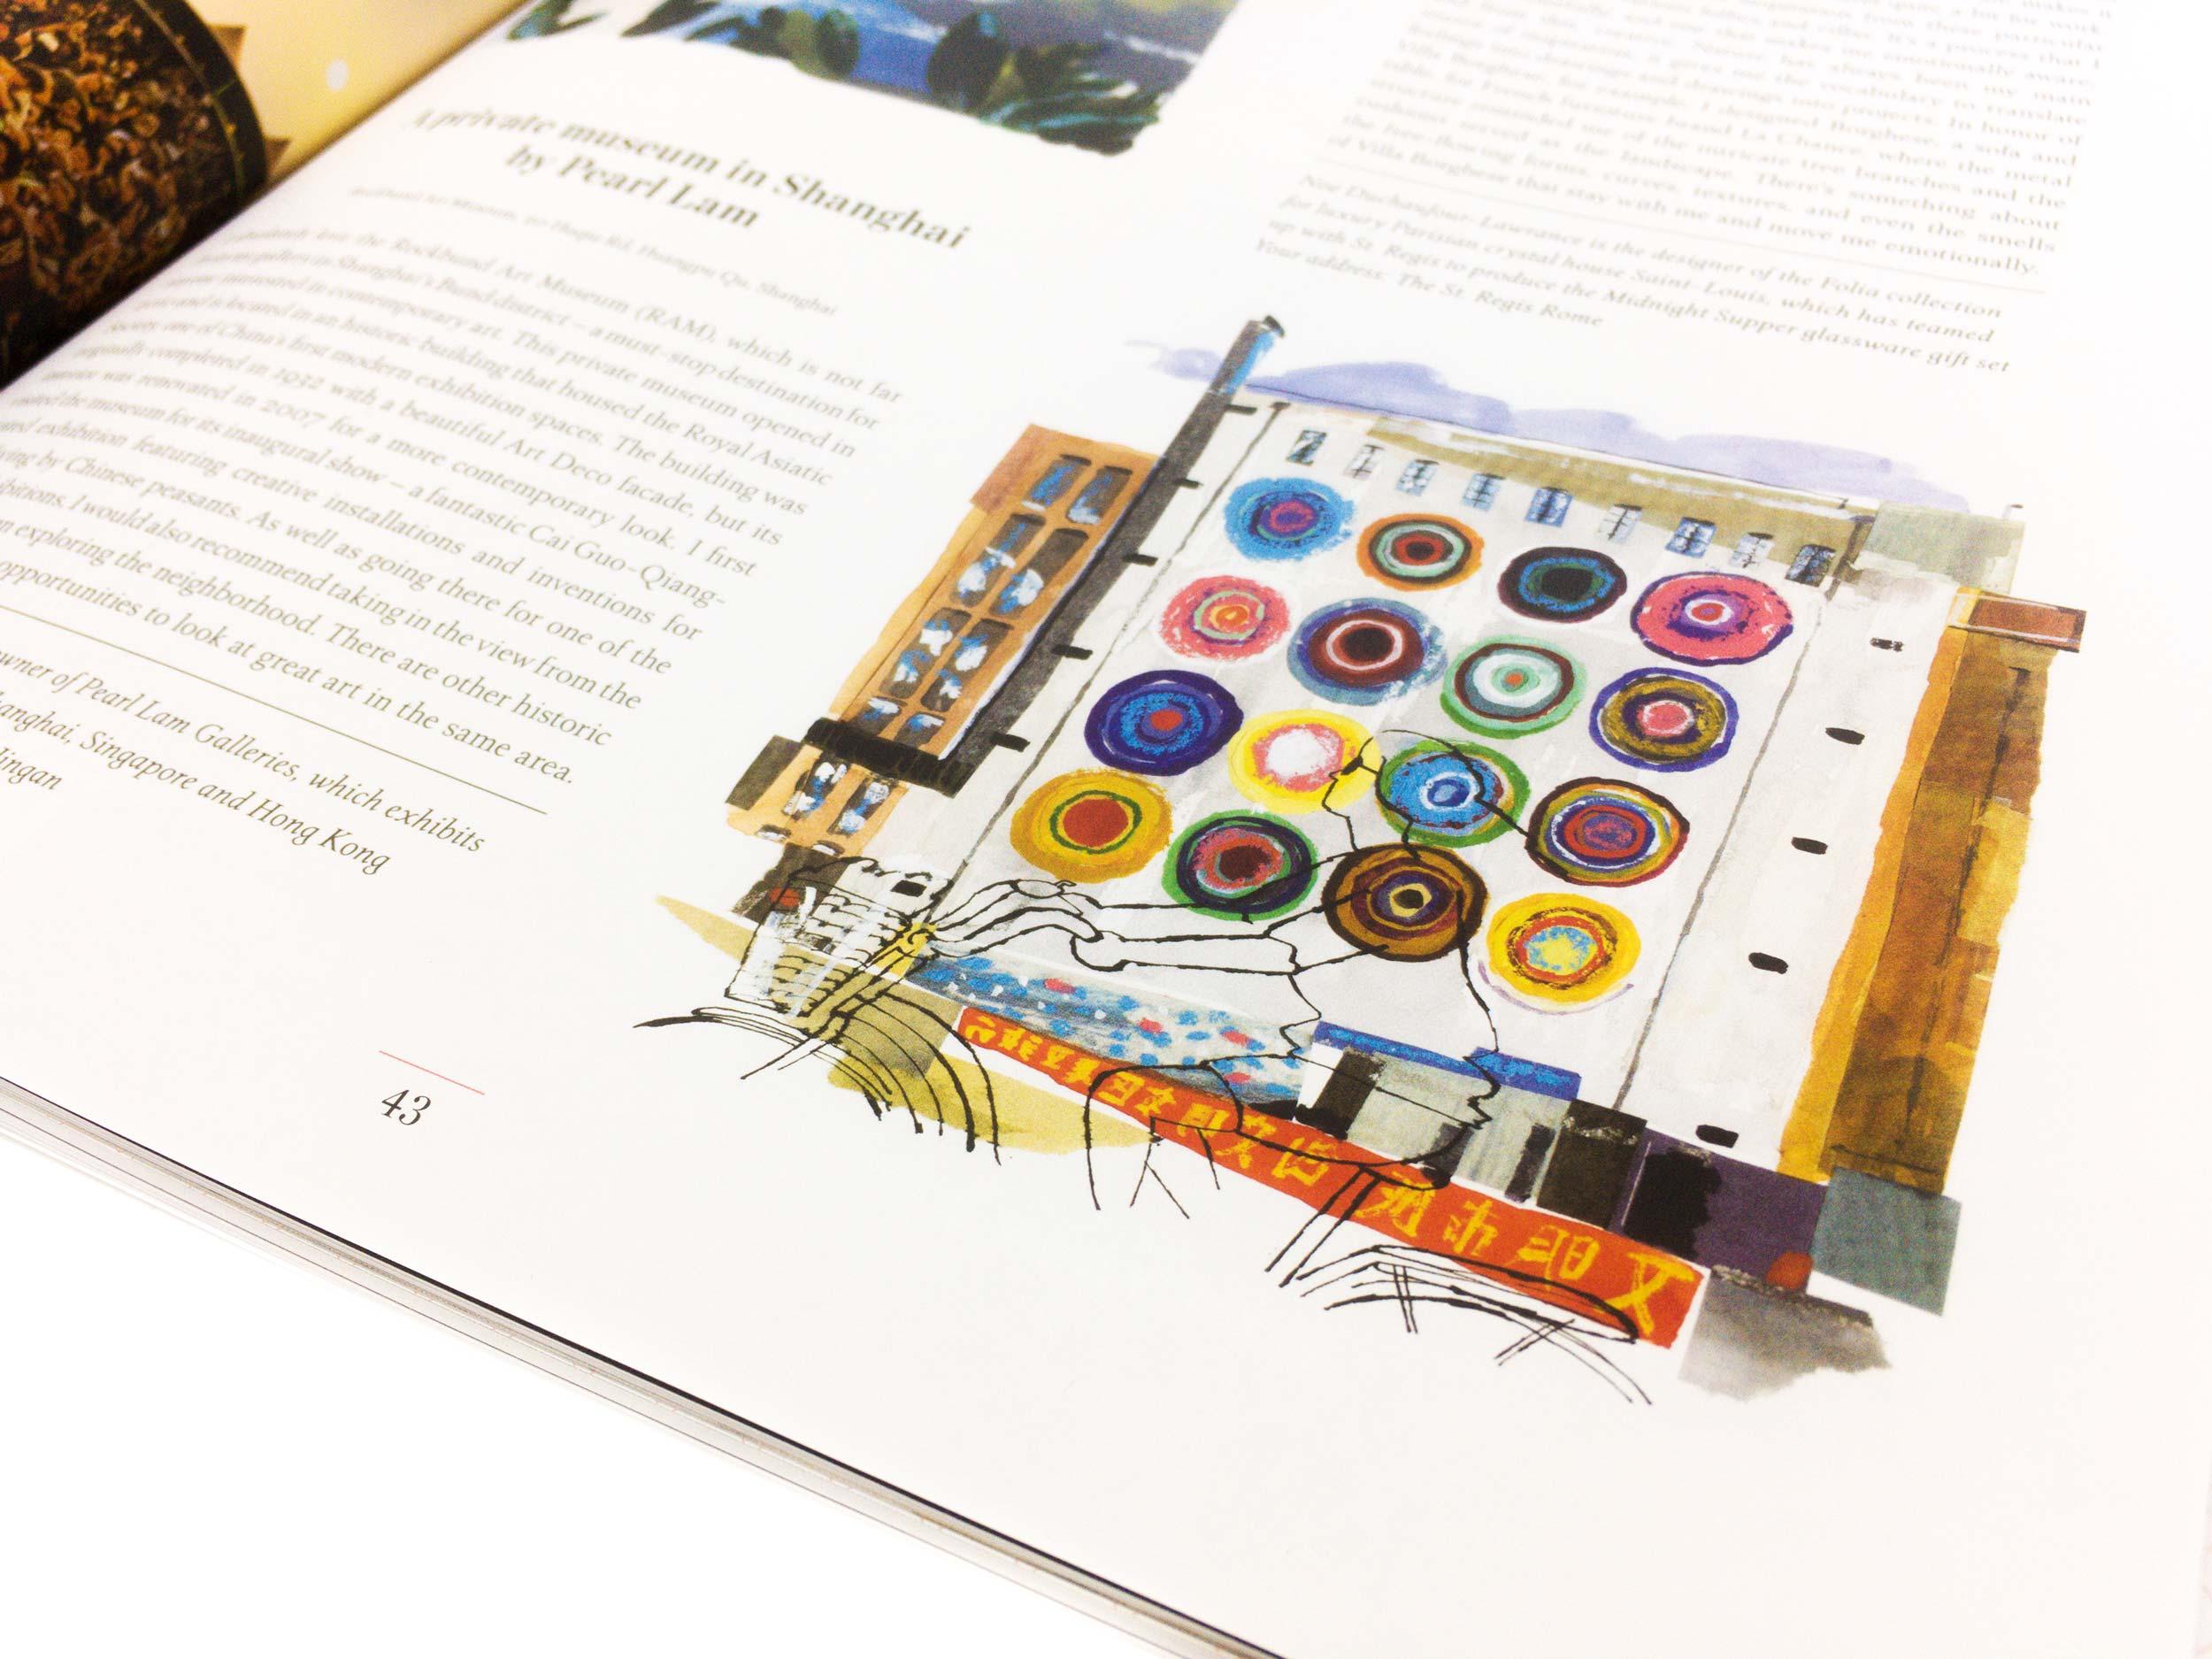 St Regis Beyond illustrations by James Oses, image 3